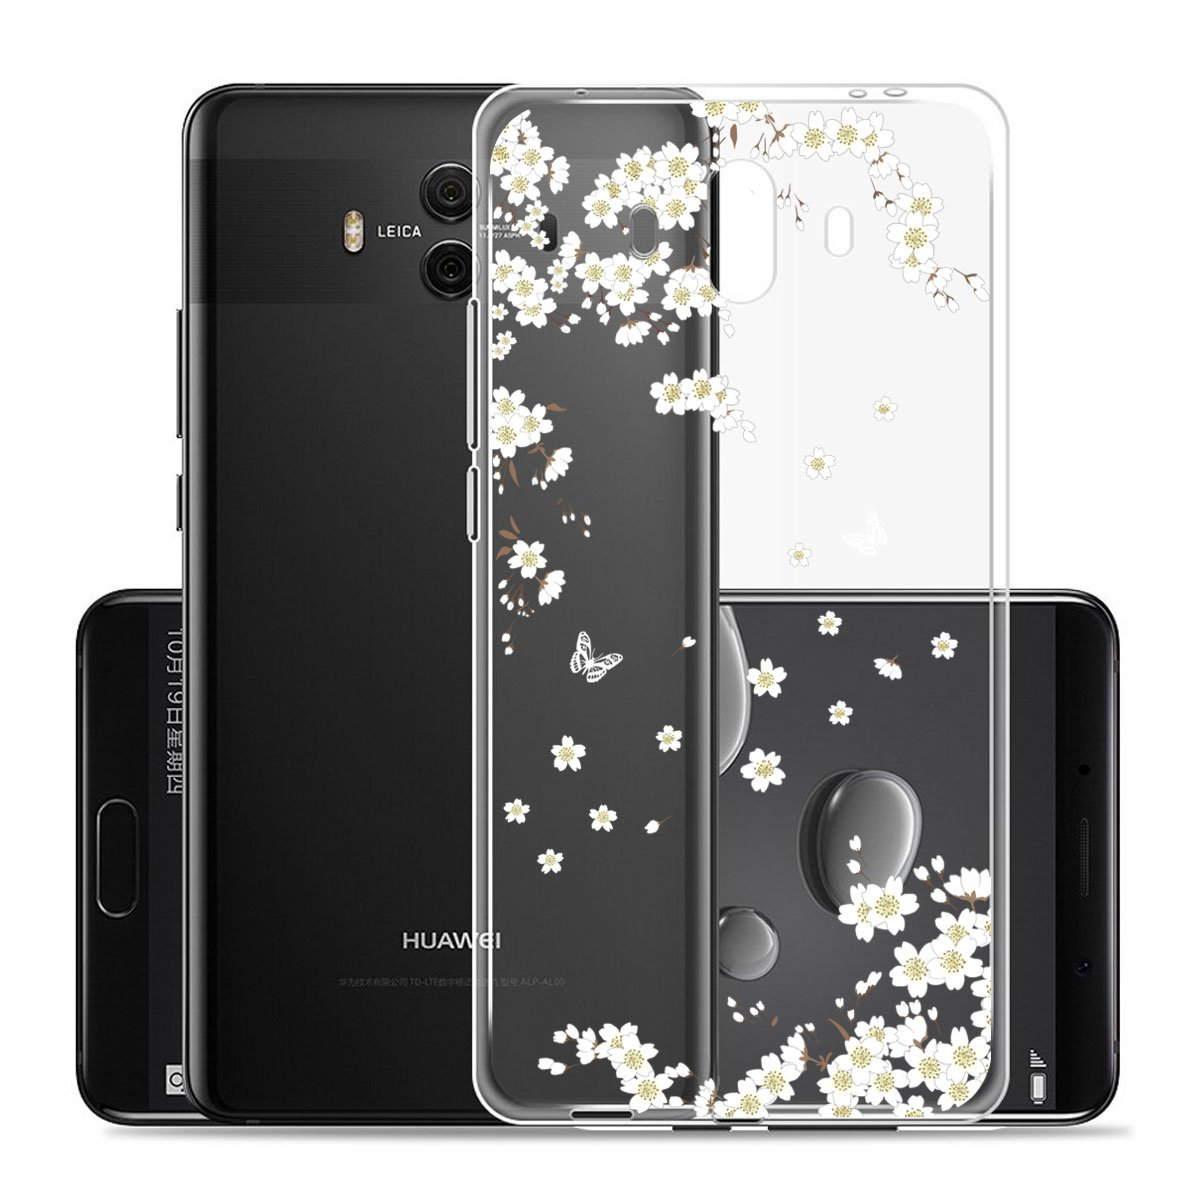 Funda para Huawei Mate 10 Carcasa , YIGA Moda Unicornio del arco iris Caso Cristal Transparente Funda TPU Gel Cubierta De Silicona Suave Tapa Case Cover para Huawei Mate 10 (5.9) WM-W-Mate10-tpu-WM110(YG)